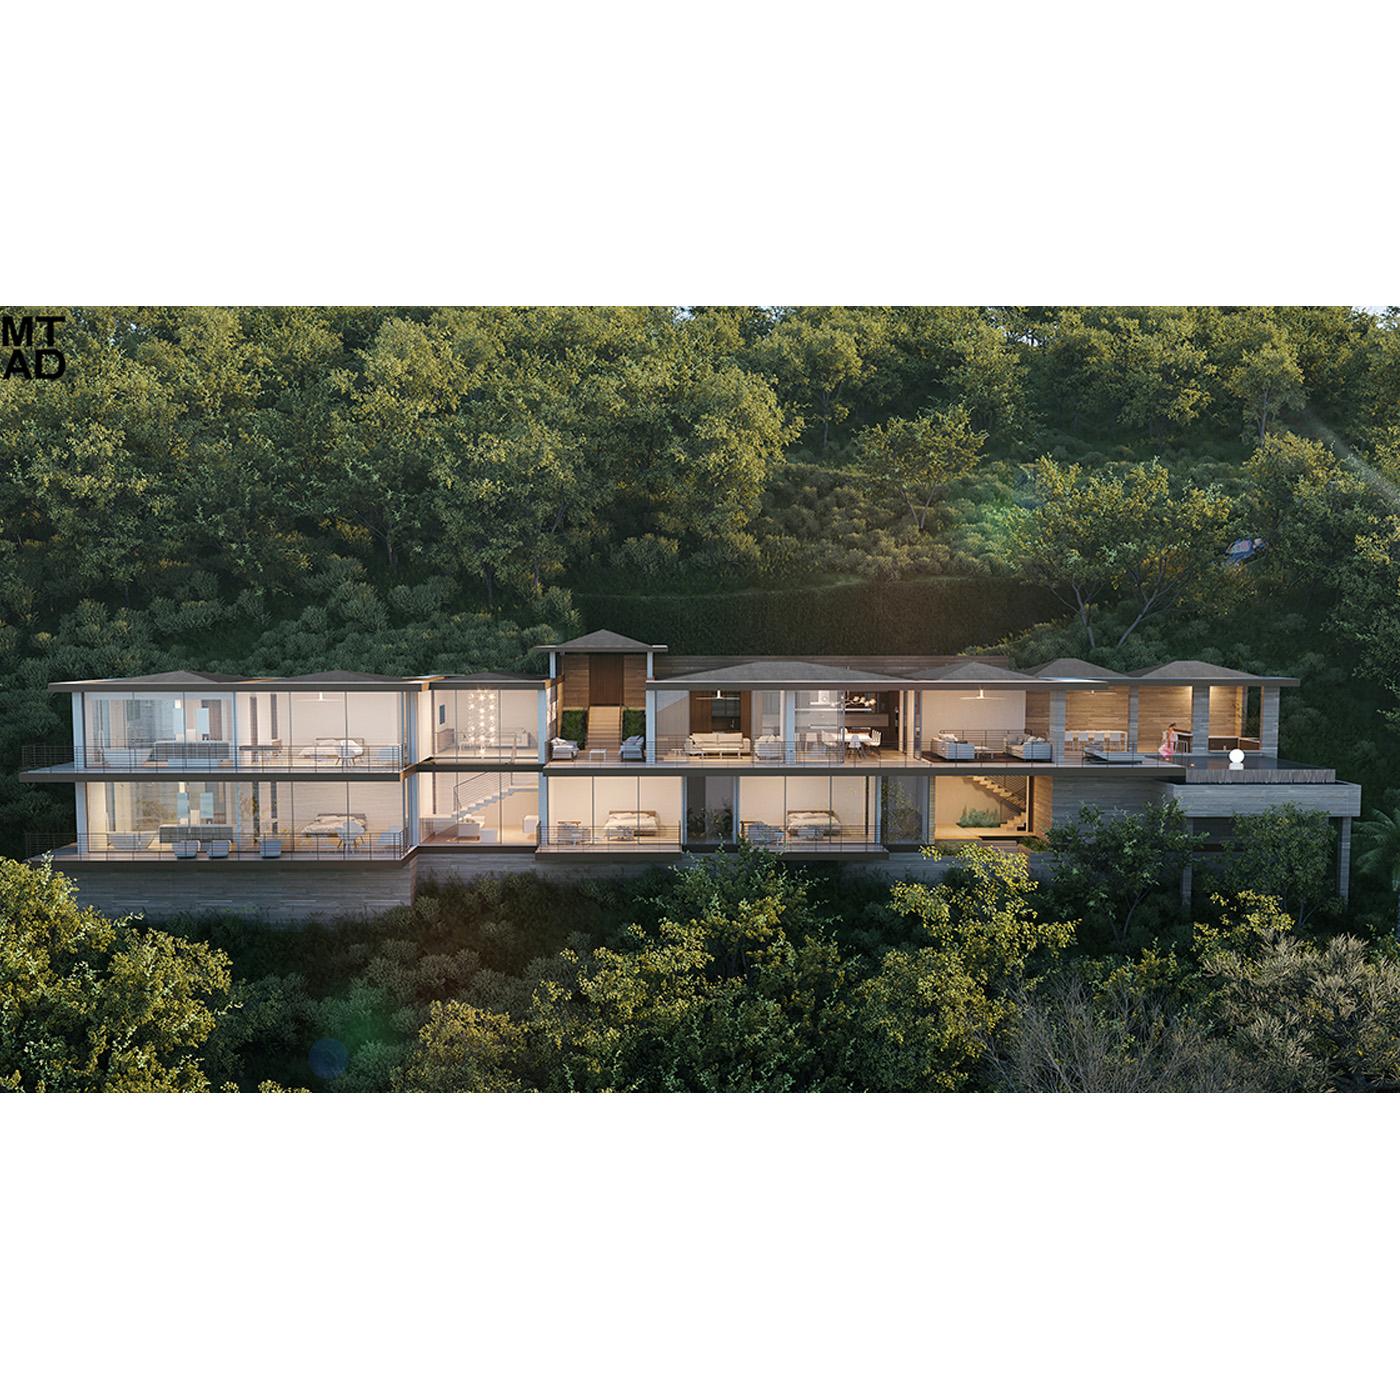 Oil Nut Bay Residence featured on British Virgin Islands Traveler, July 2018